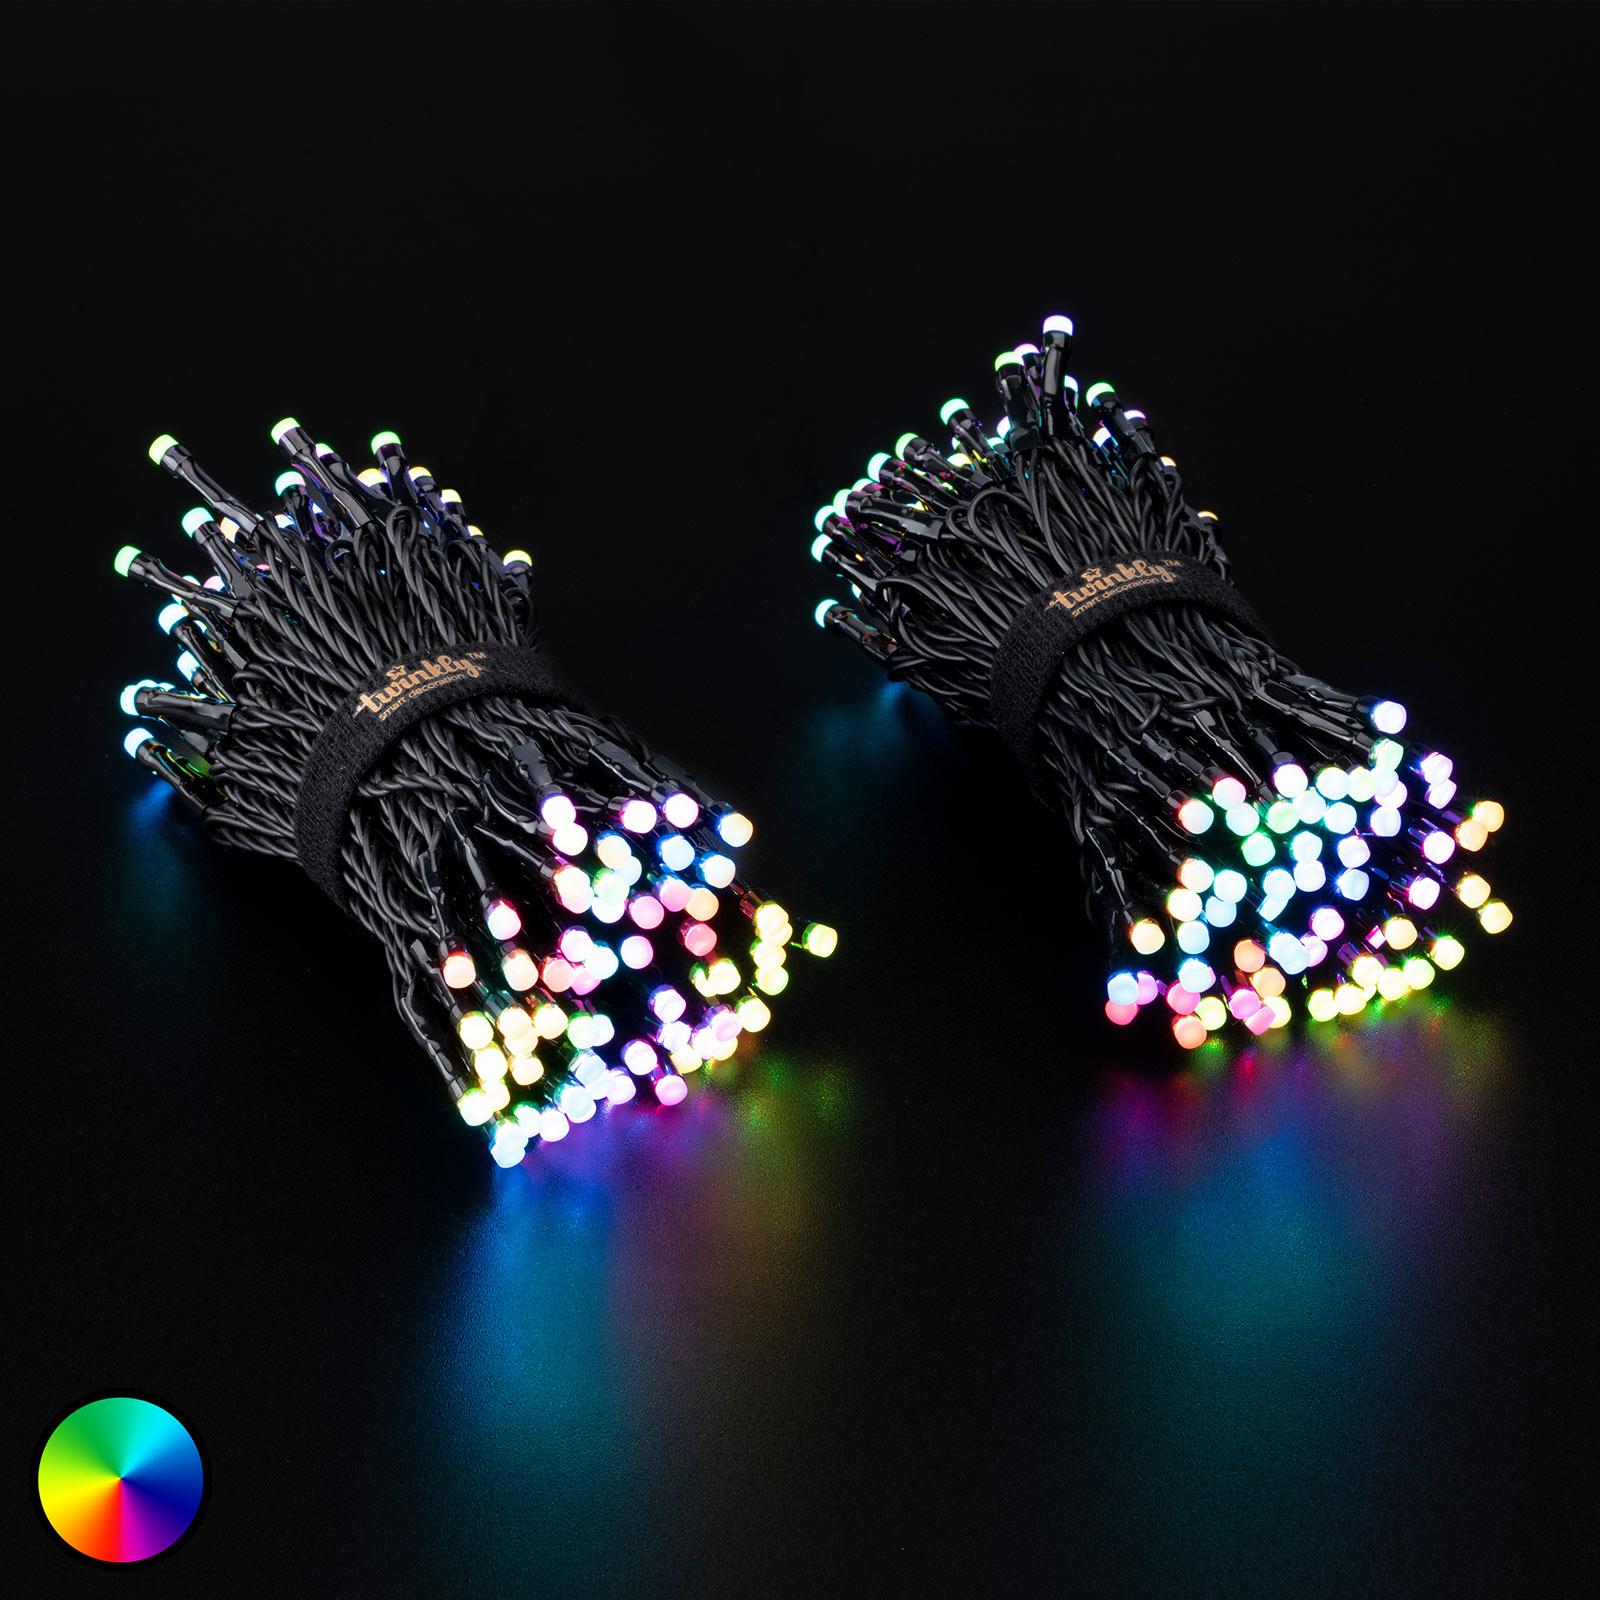 Valoketju Twinkly RGBW, 250-lamppuinen 20 m musta